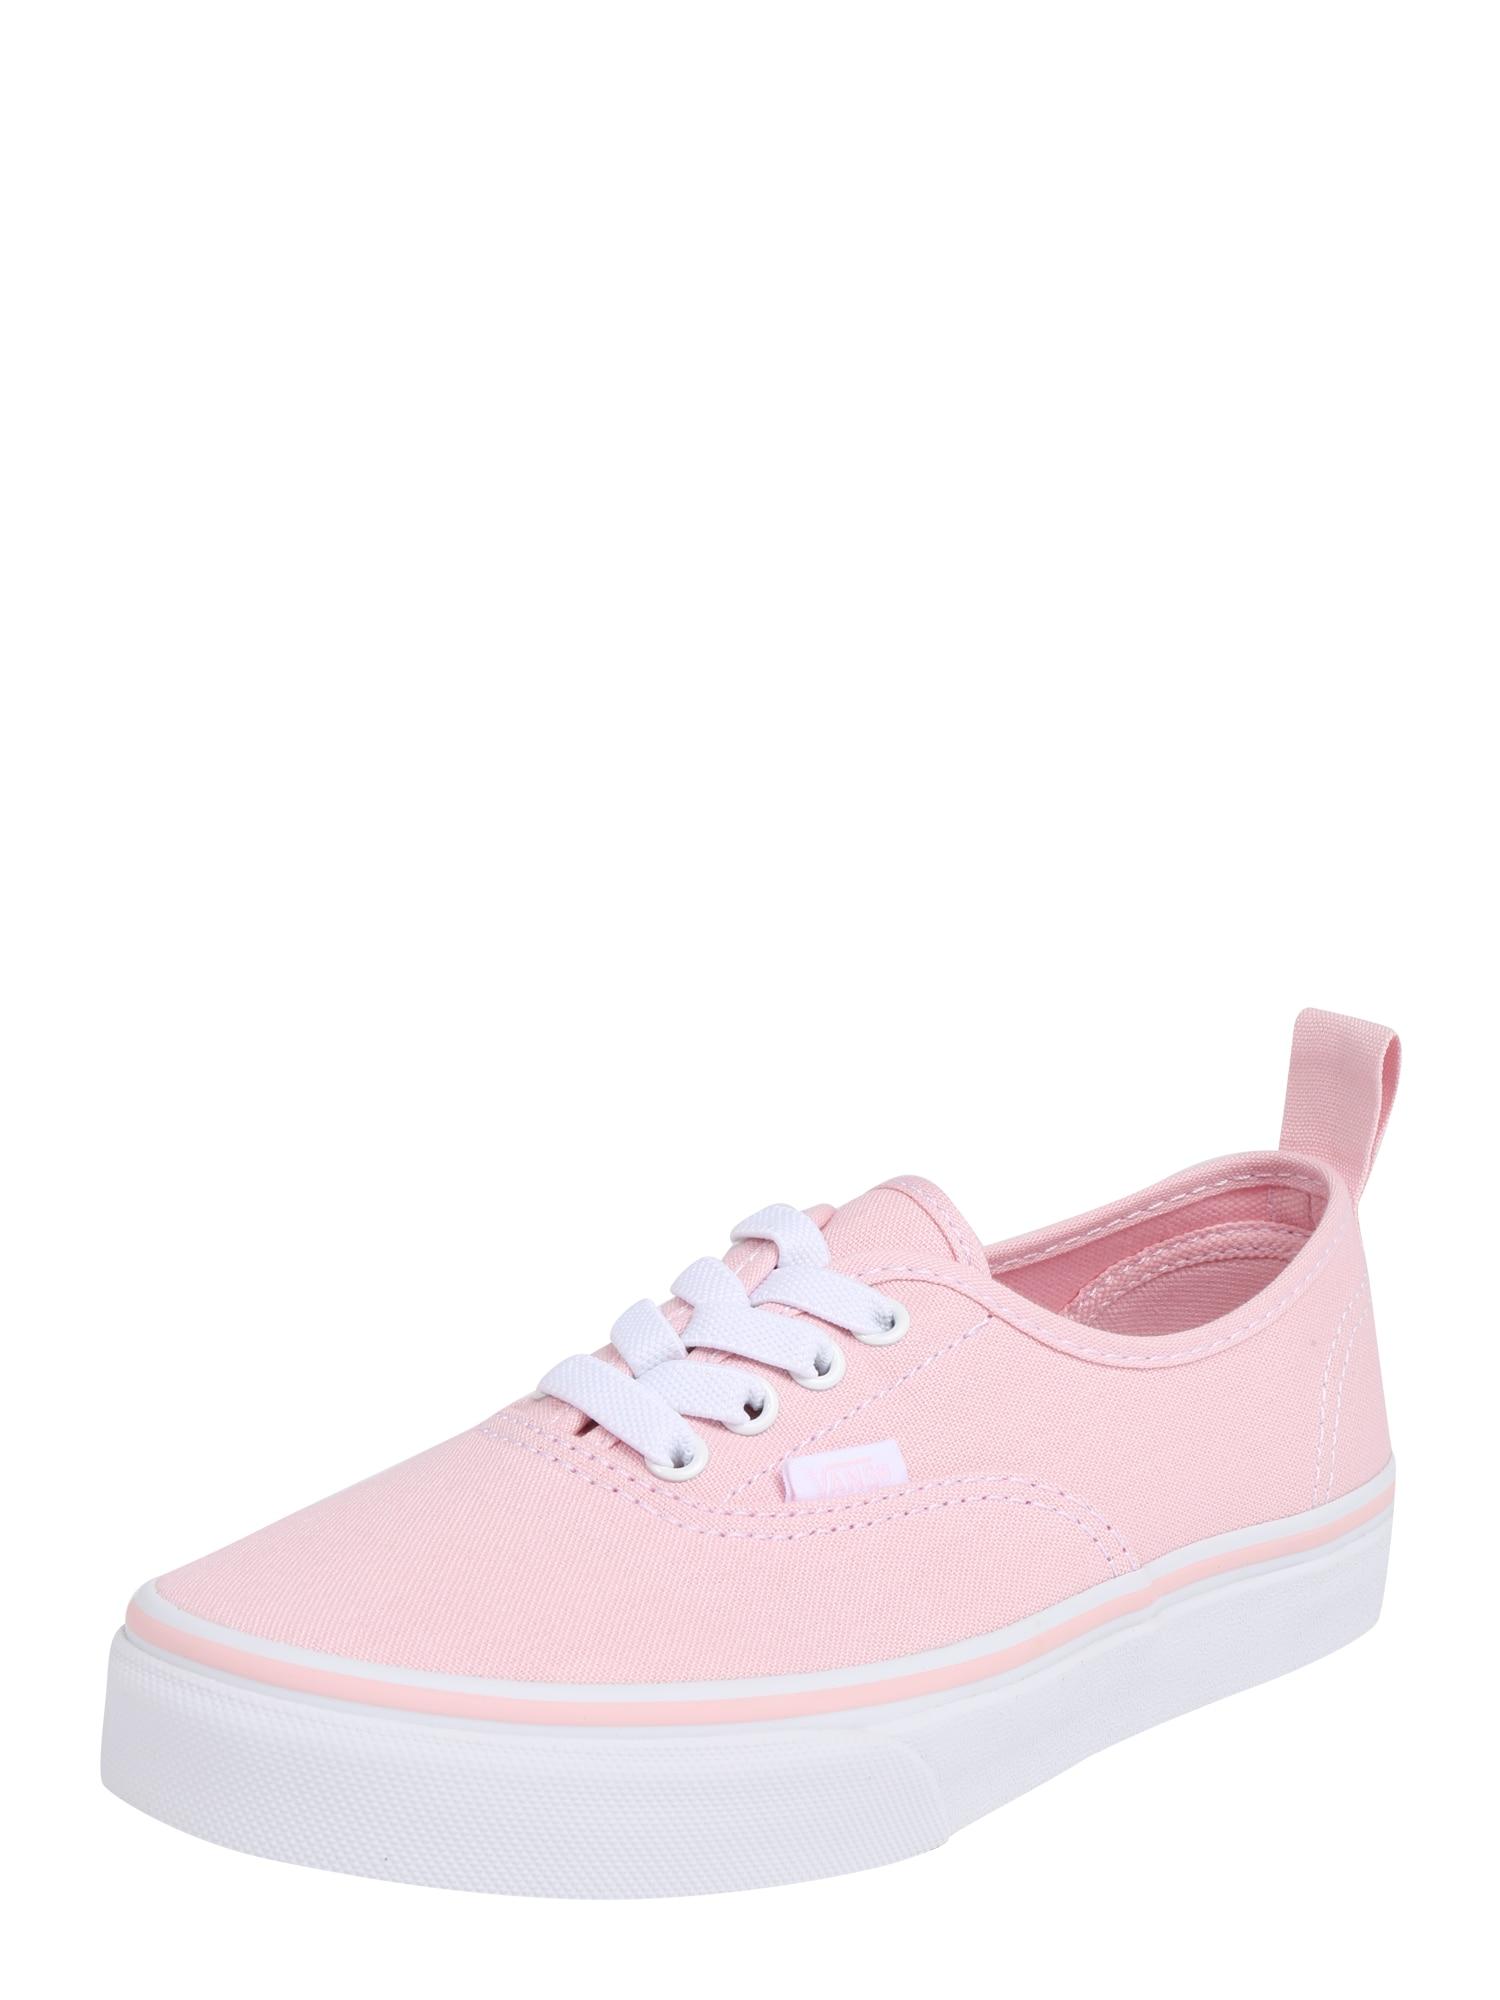 Tenisky Authentic Elastic růžová bílá VANS